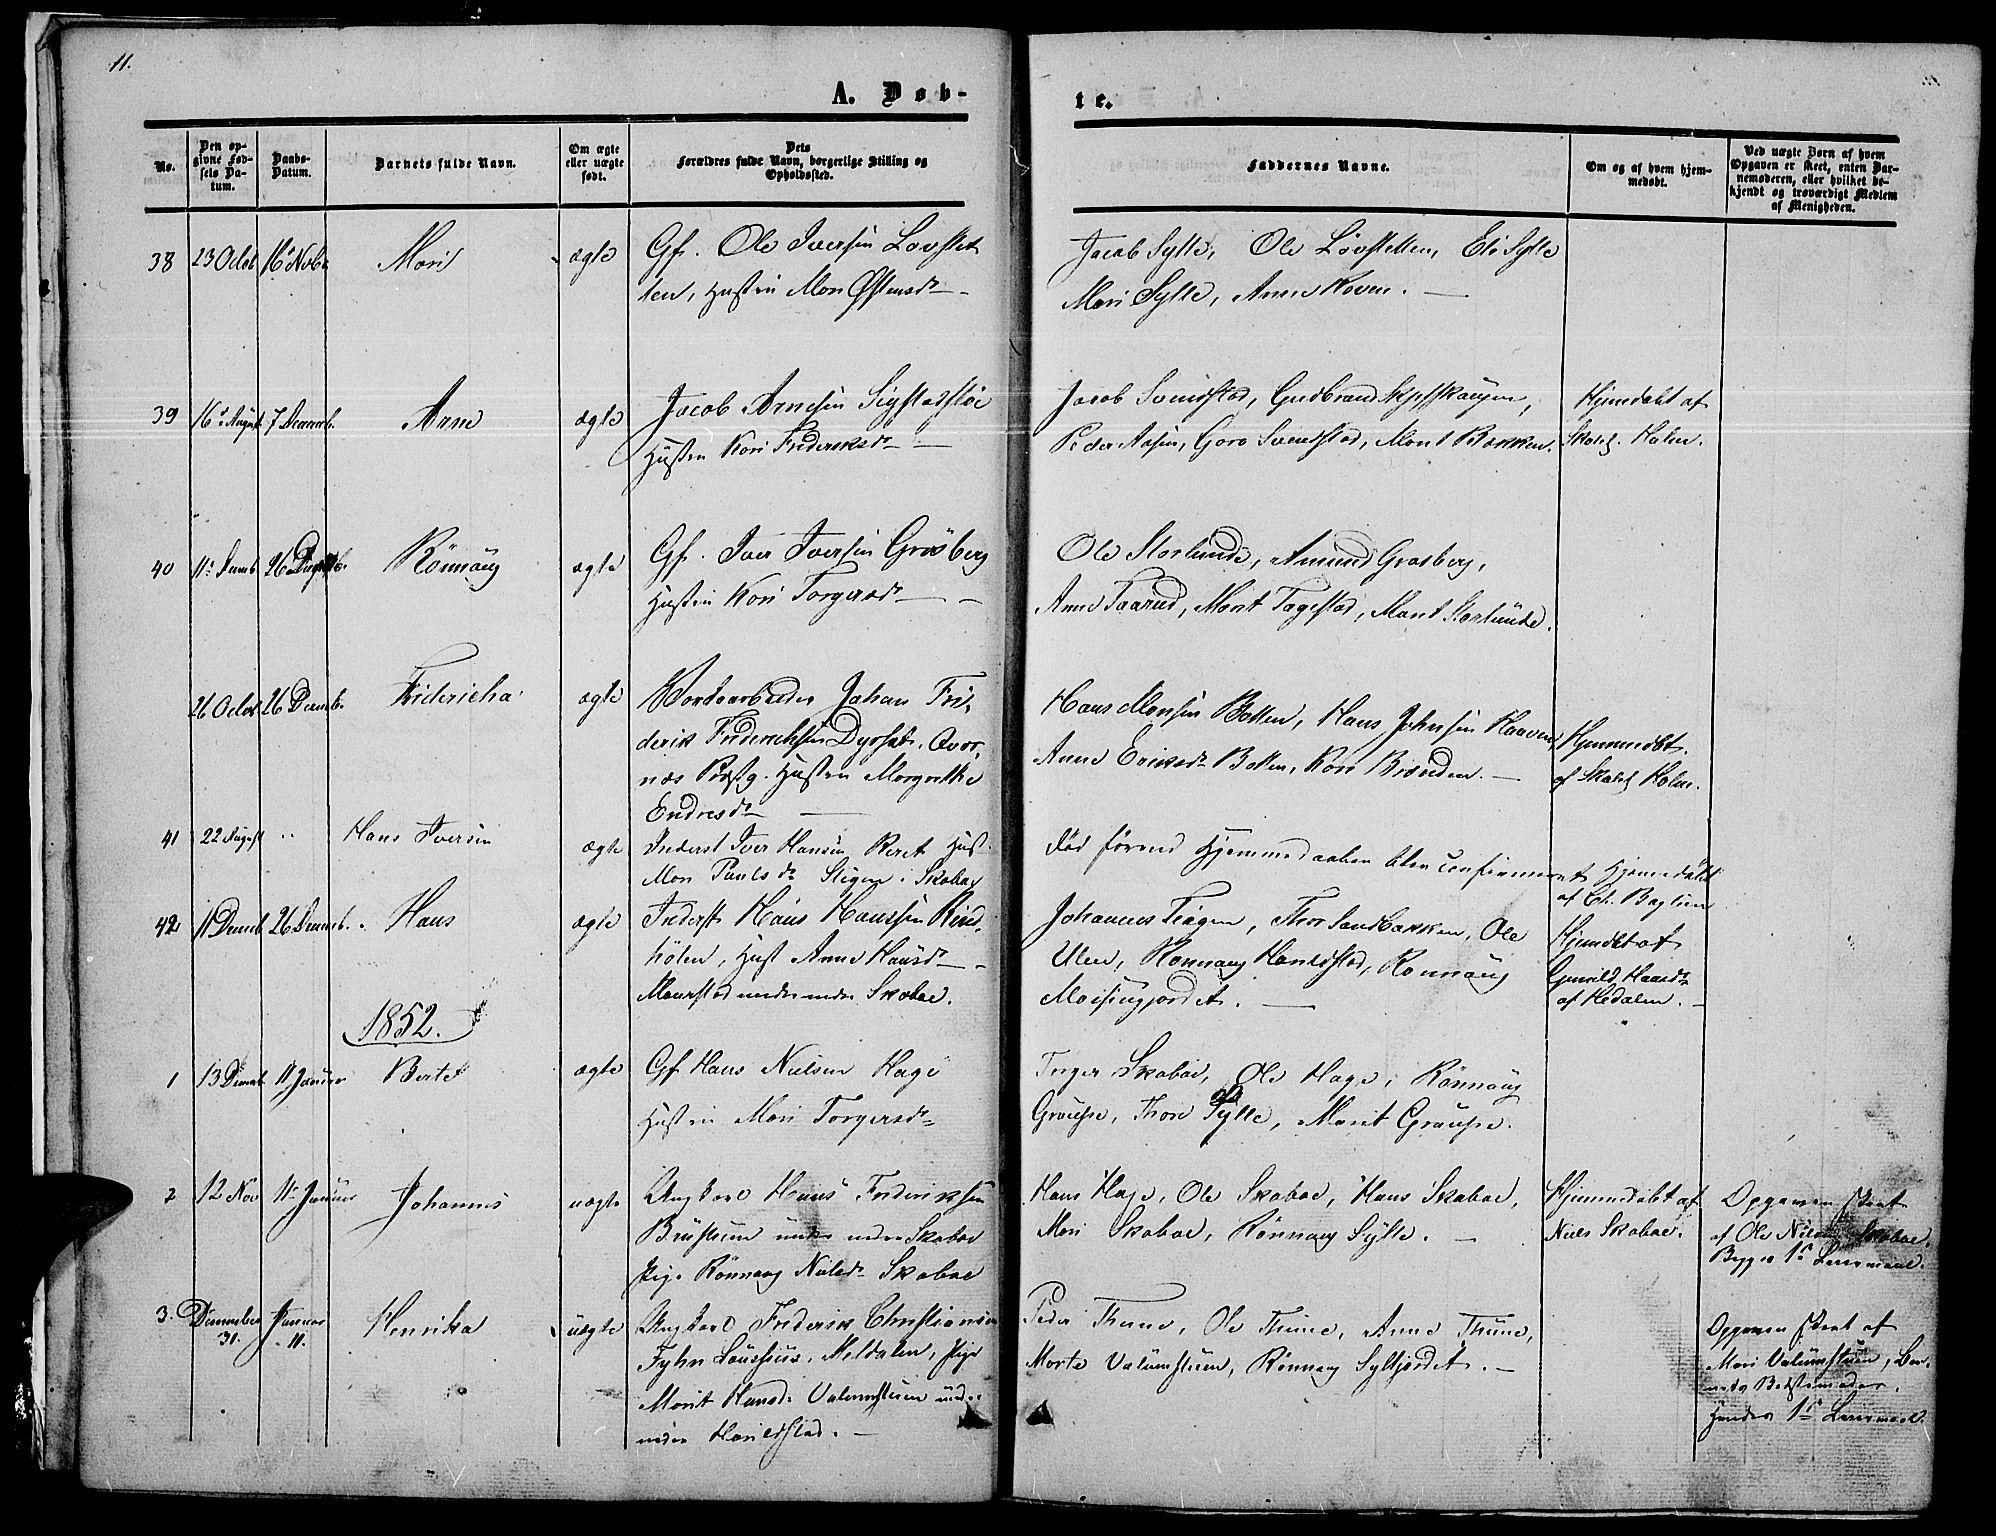 SAH, Nord-Fron prestekontor, Klokkerbok nr. 2, 1851-1883, s. 11